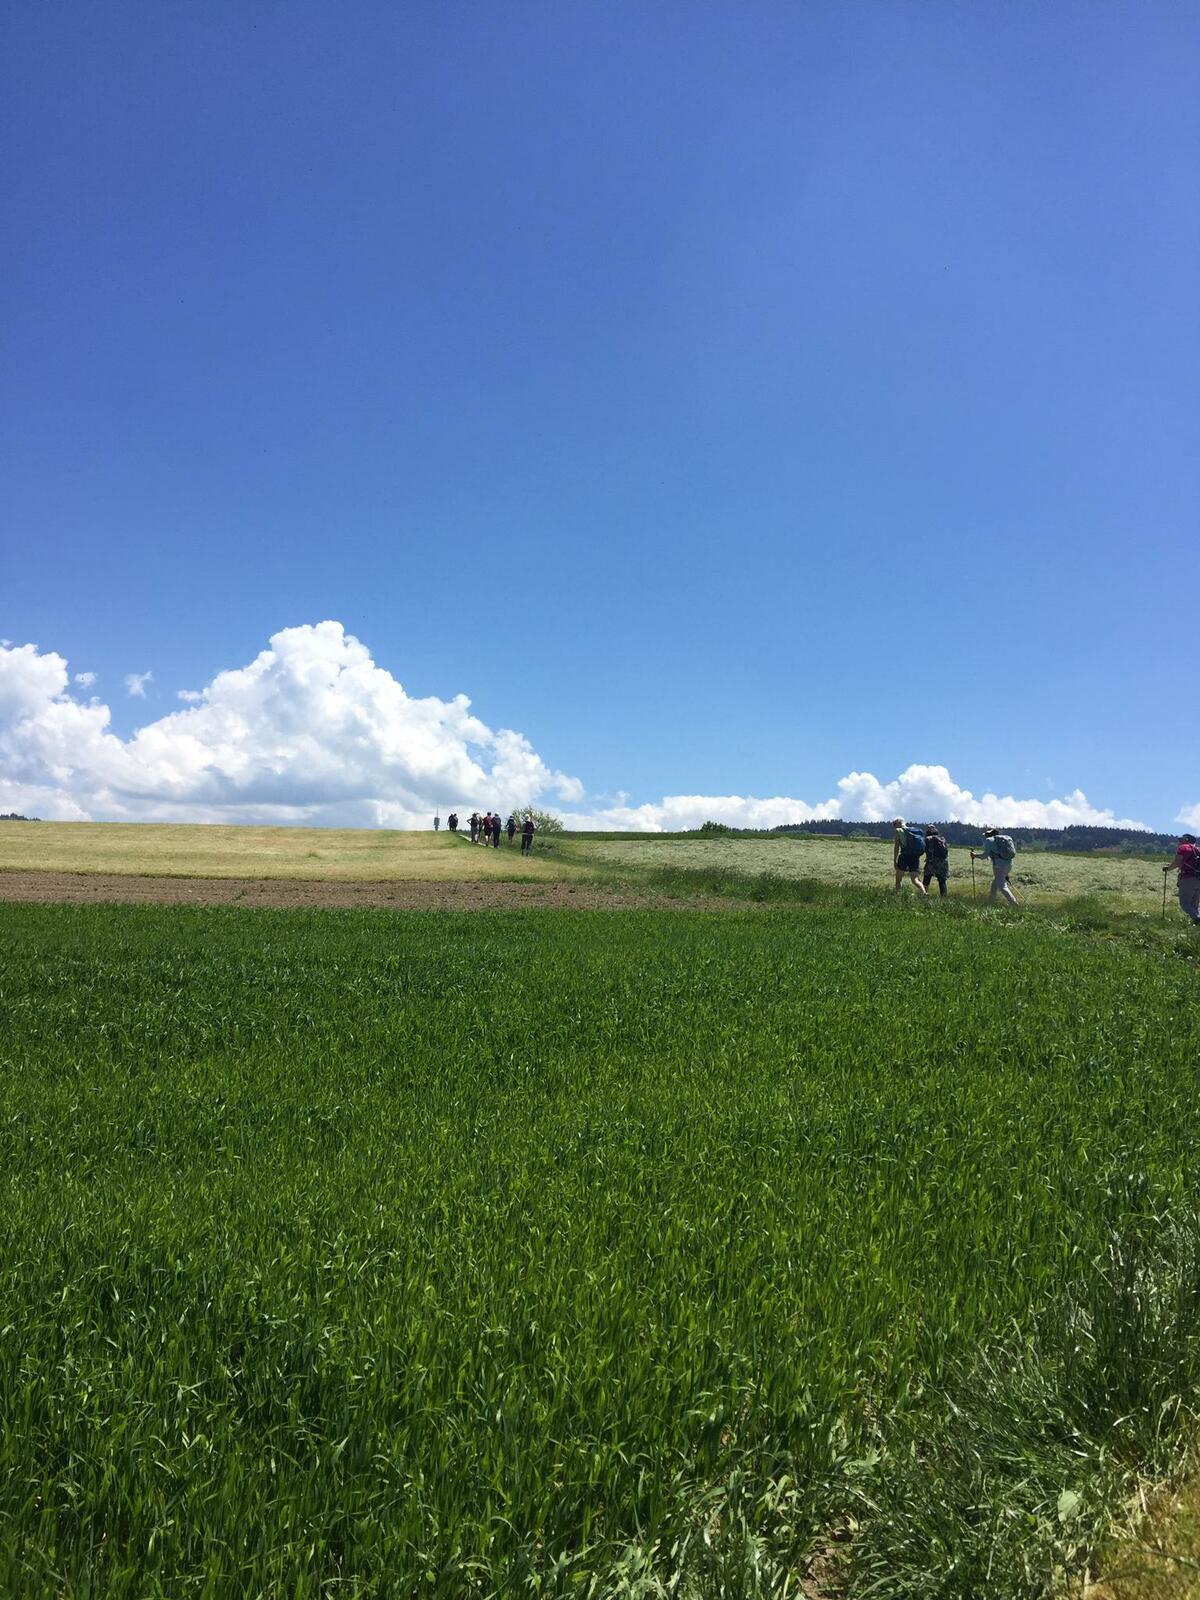 Mardi 1 juin : Grangettes près Romont Villargiroud